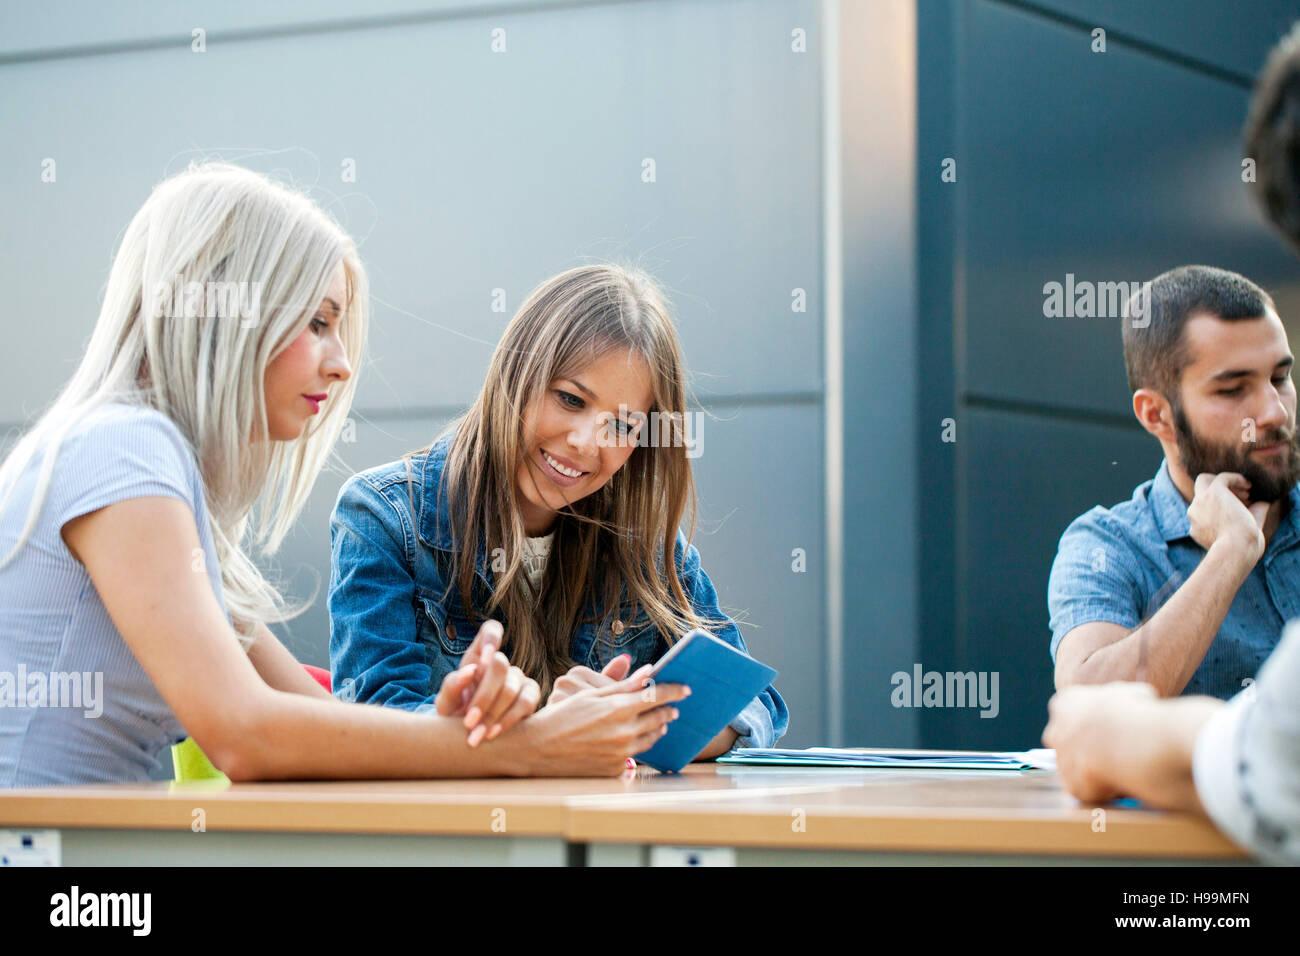 Businesswomen using digital tablet in workshop Photo Stock